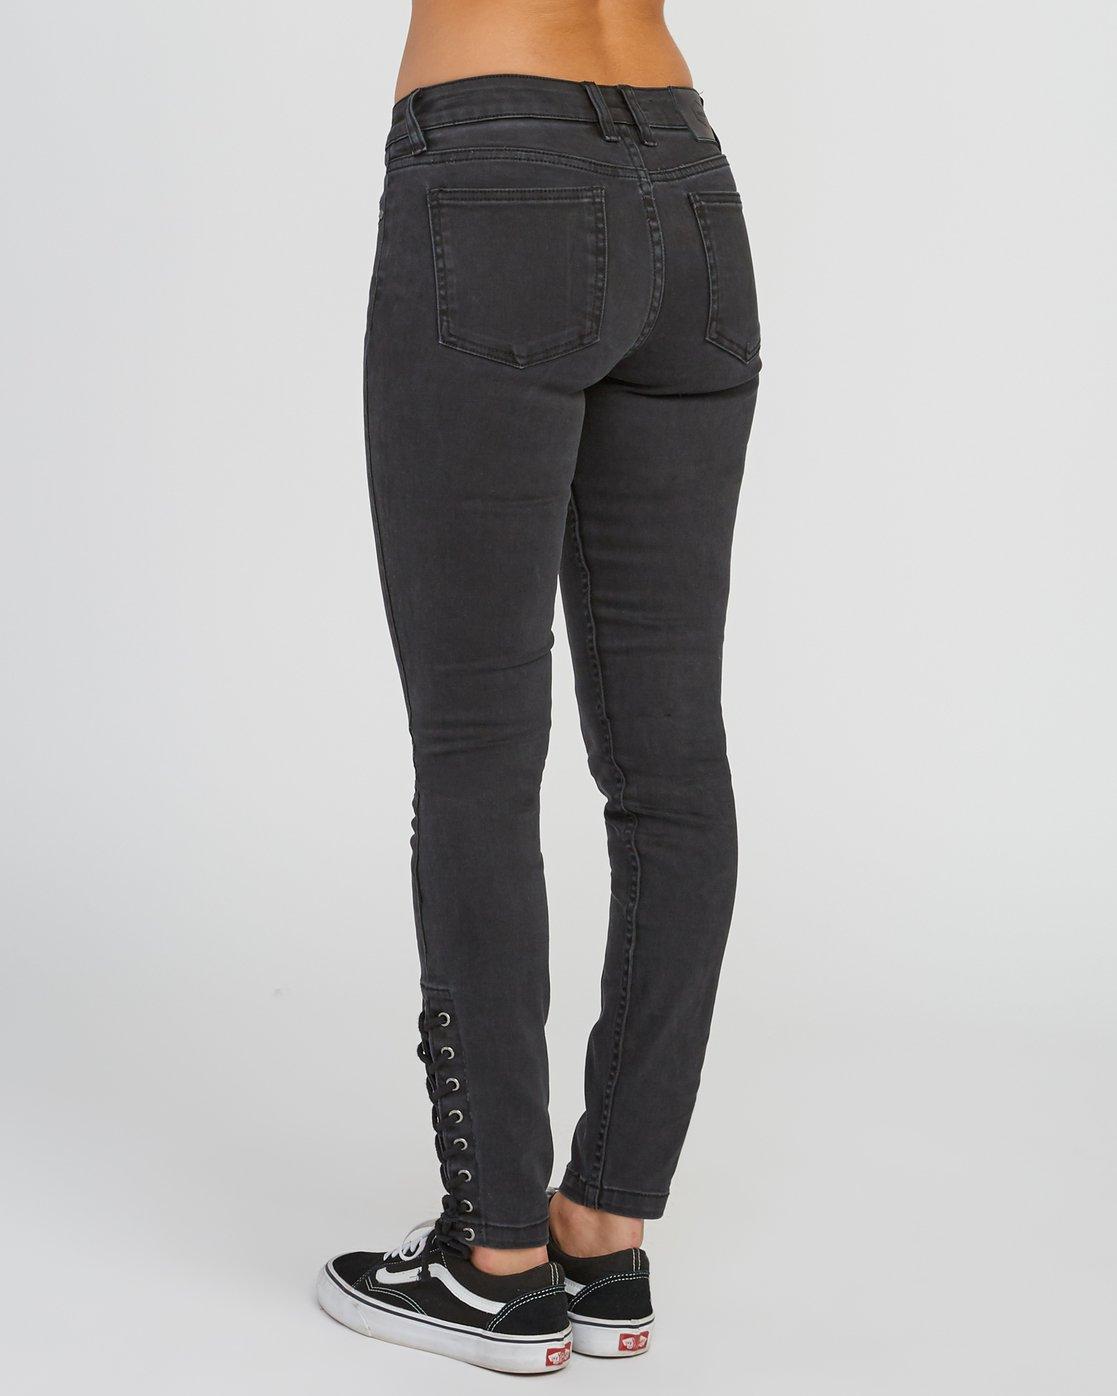 2 Dayley Mid Rise Denim Jeans Black WCDP02DA RVCA